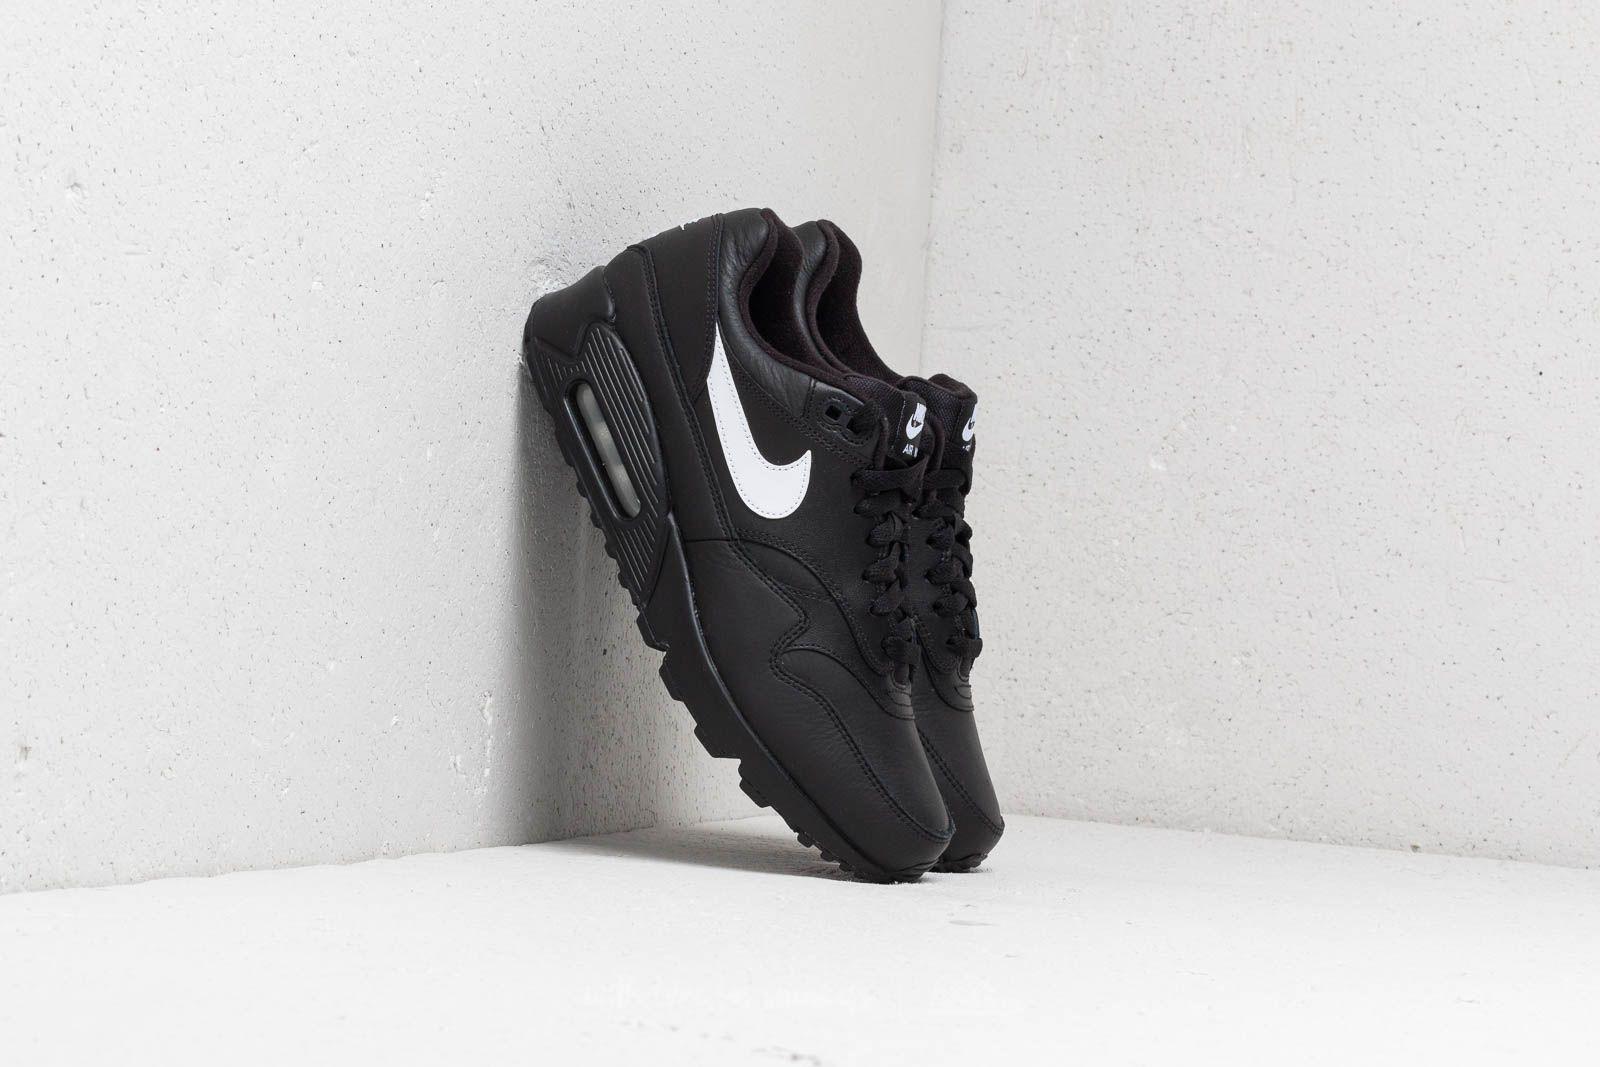 newest 9ca27 54025 Nike Air Max 90 1 Black  White-Black za skvělou cenu 3 990